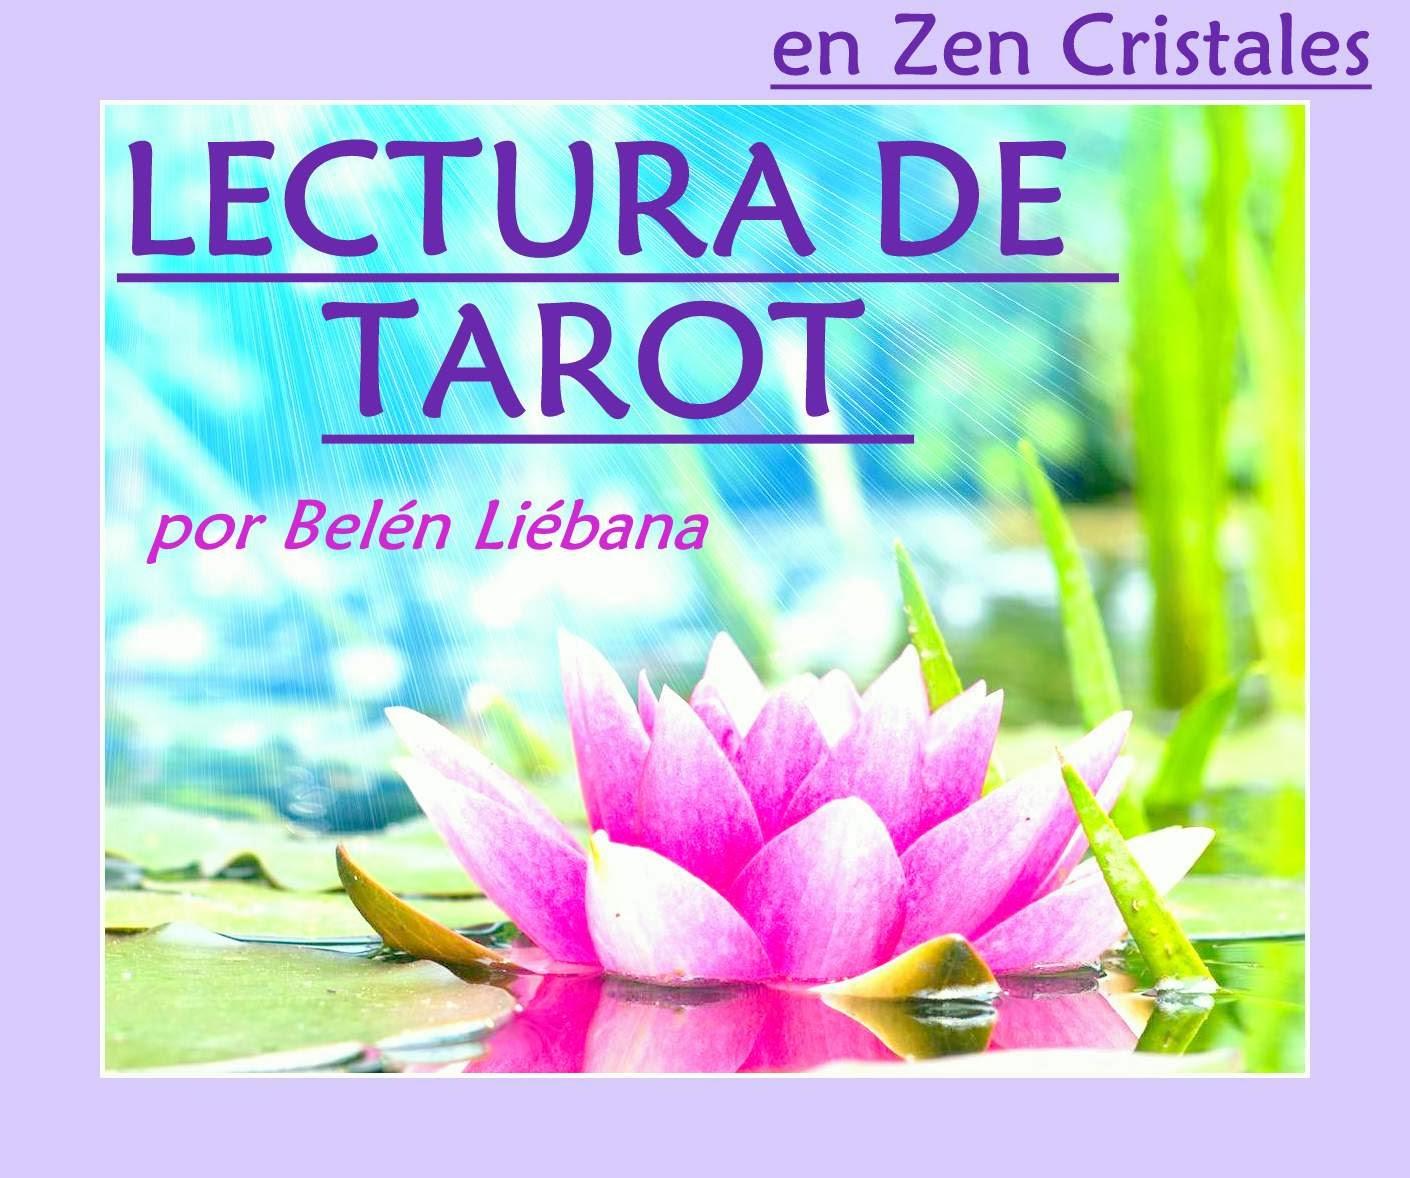 Lectura de Tarot en Zen Cristales